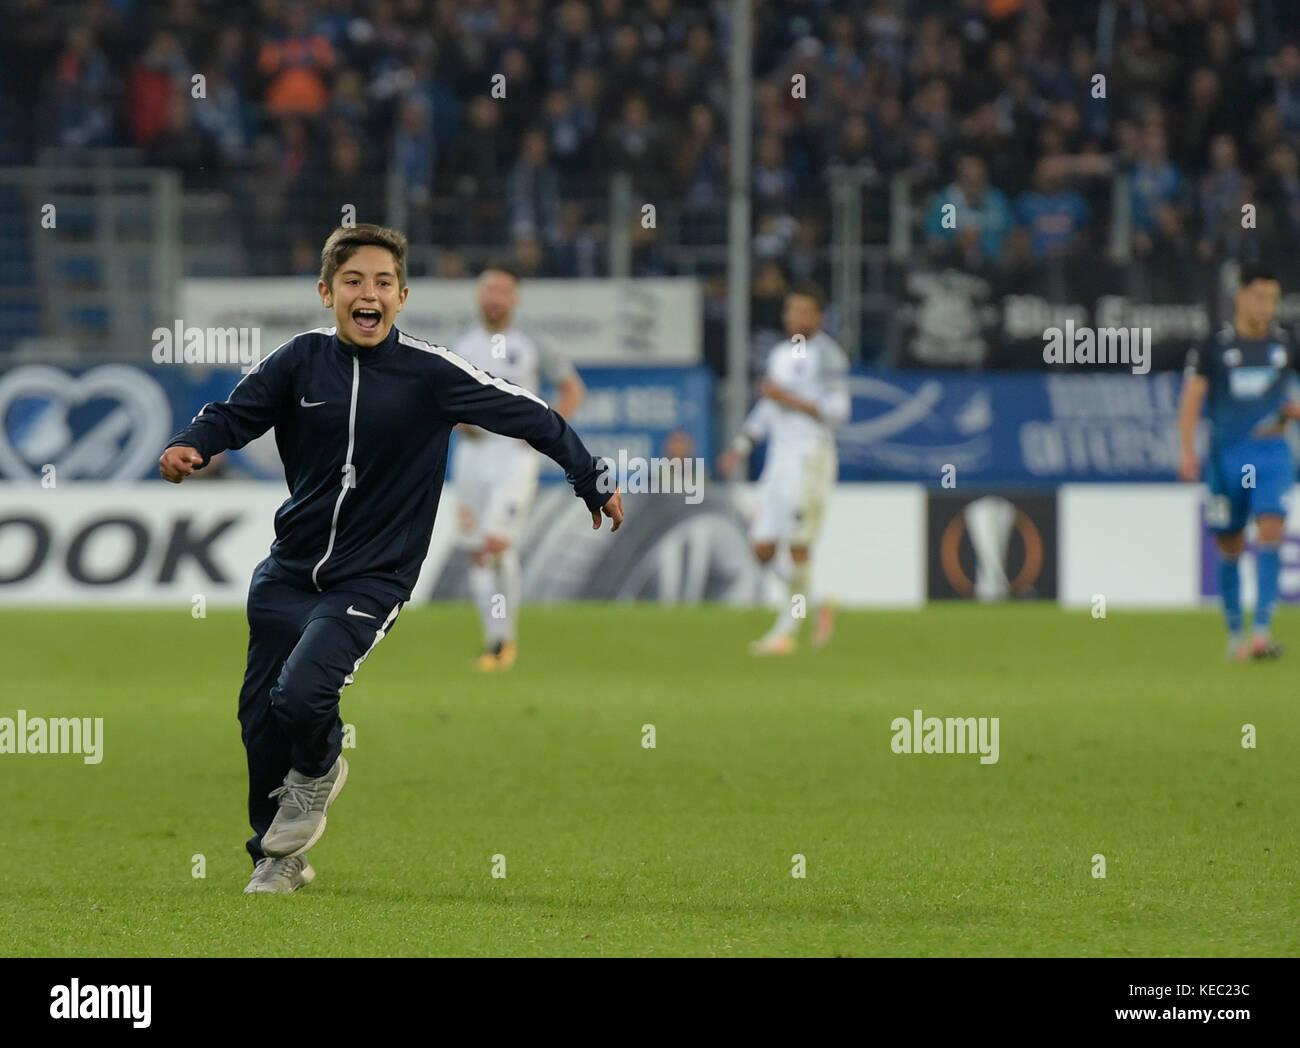 Sinsheim, GER - October 19, Rhein-Neckar-Arena . A kid runs to the field during the the game between TSG Hoffenheim - Stock Image